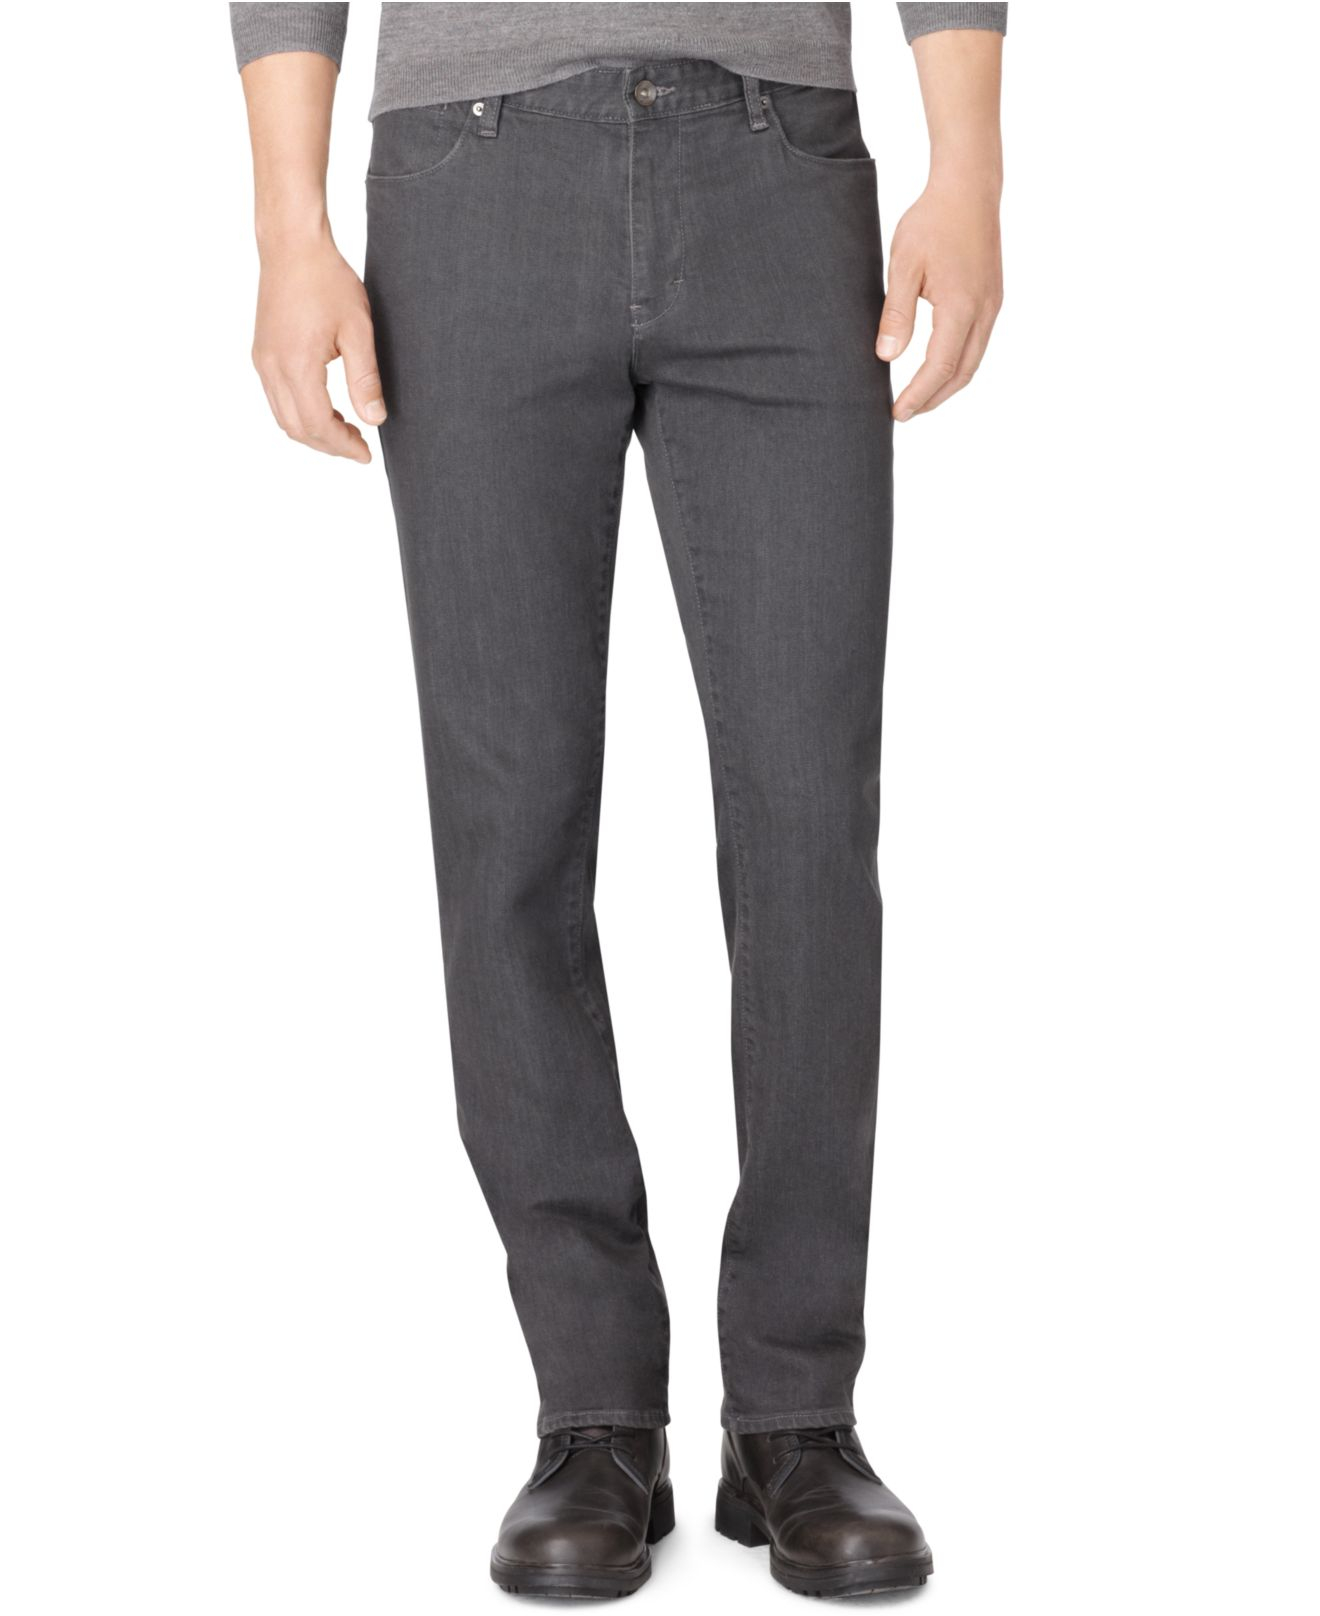 calvin klein grey slim straight fit jeans in gray for men. Black Bedroom Furniture Sets. Home Design Ideas